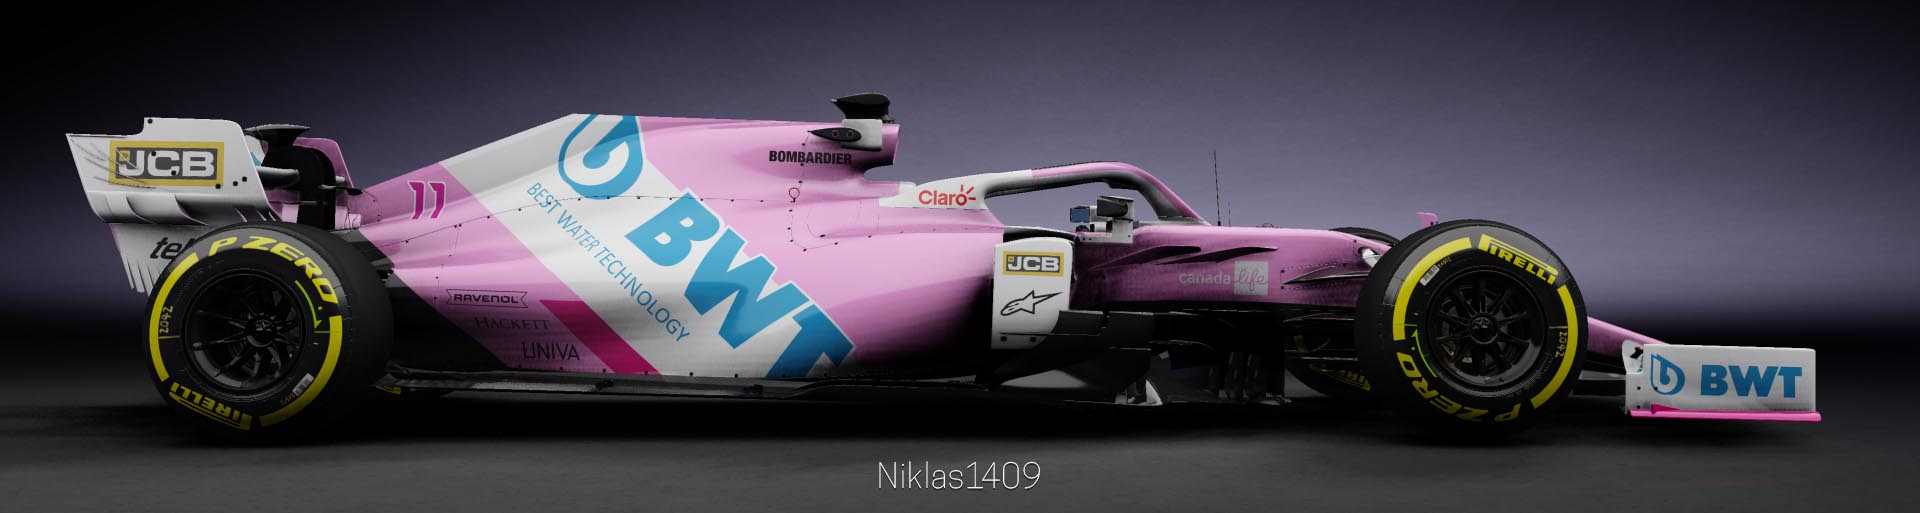 racingpoint.jpg